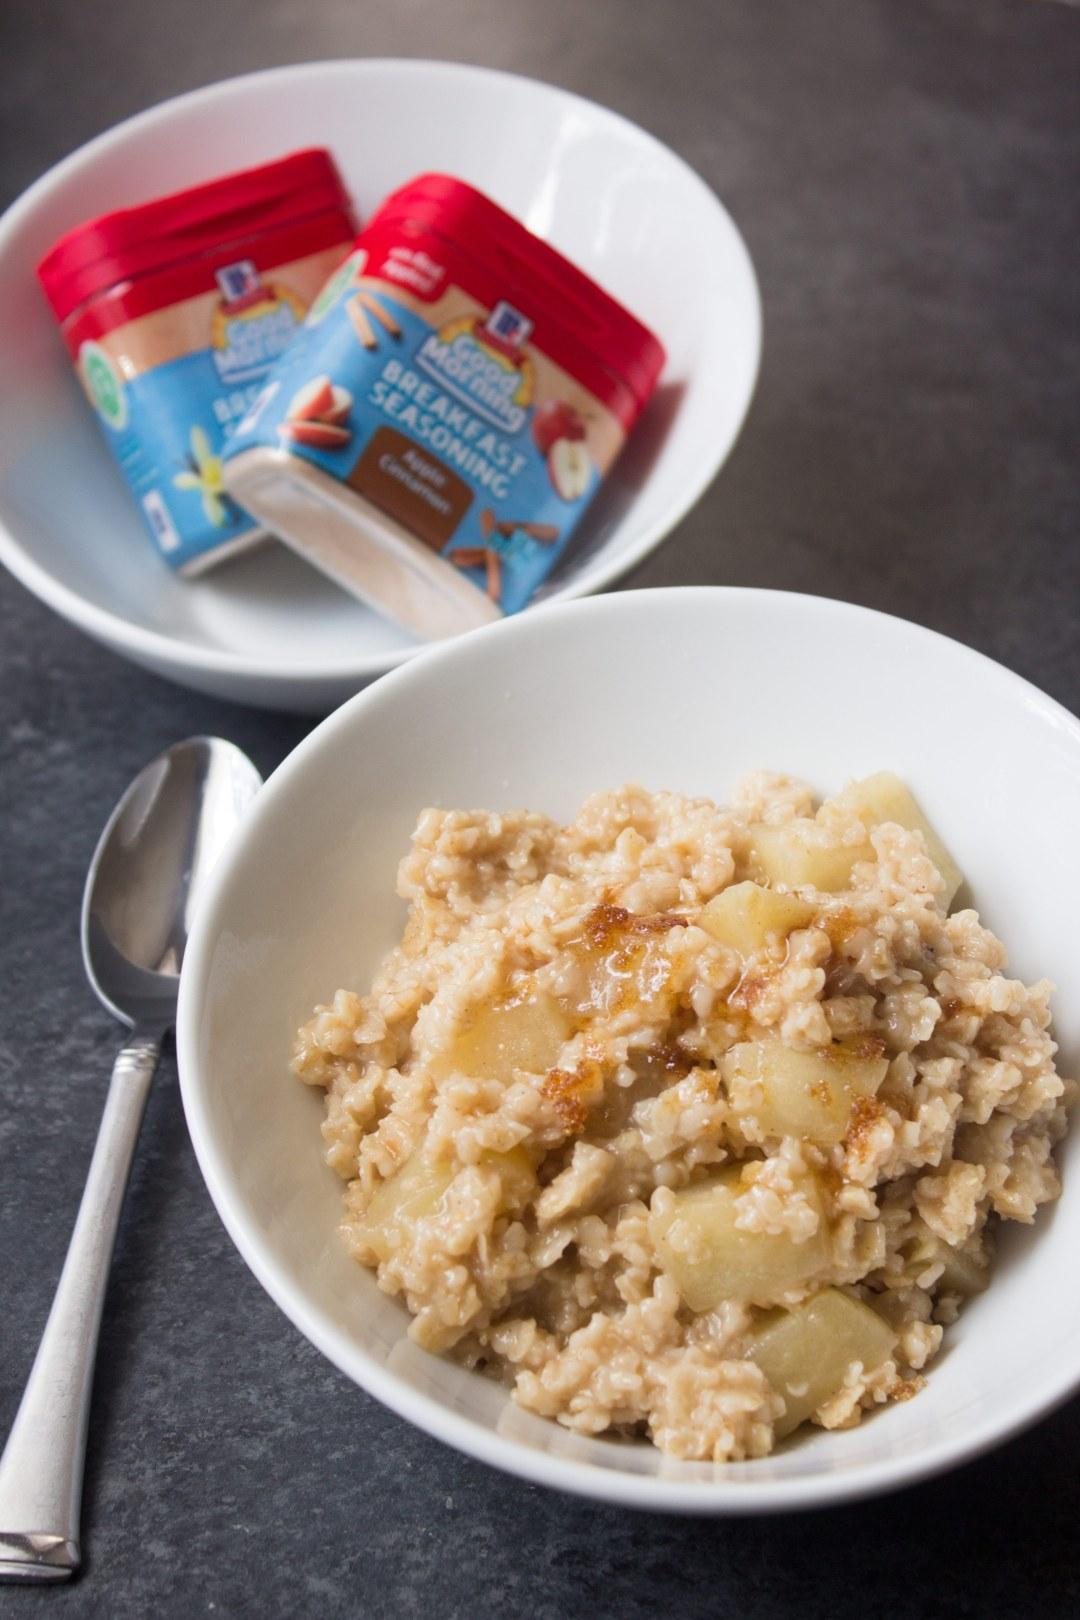 Overnight apple oatmeal, slow cooker oatmeal, slow cooker apple oatmeal, overnight oatmeal, apple, breakfast, oatmeal, apple oatmeal, recipe, coco and ash